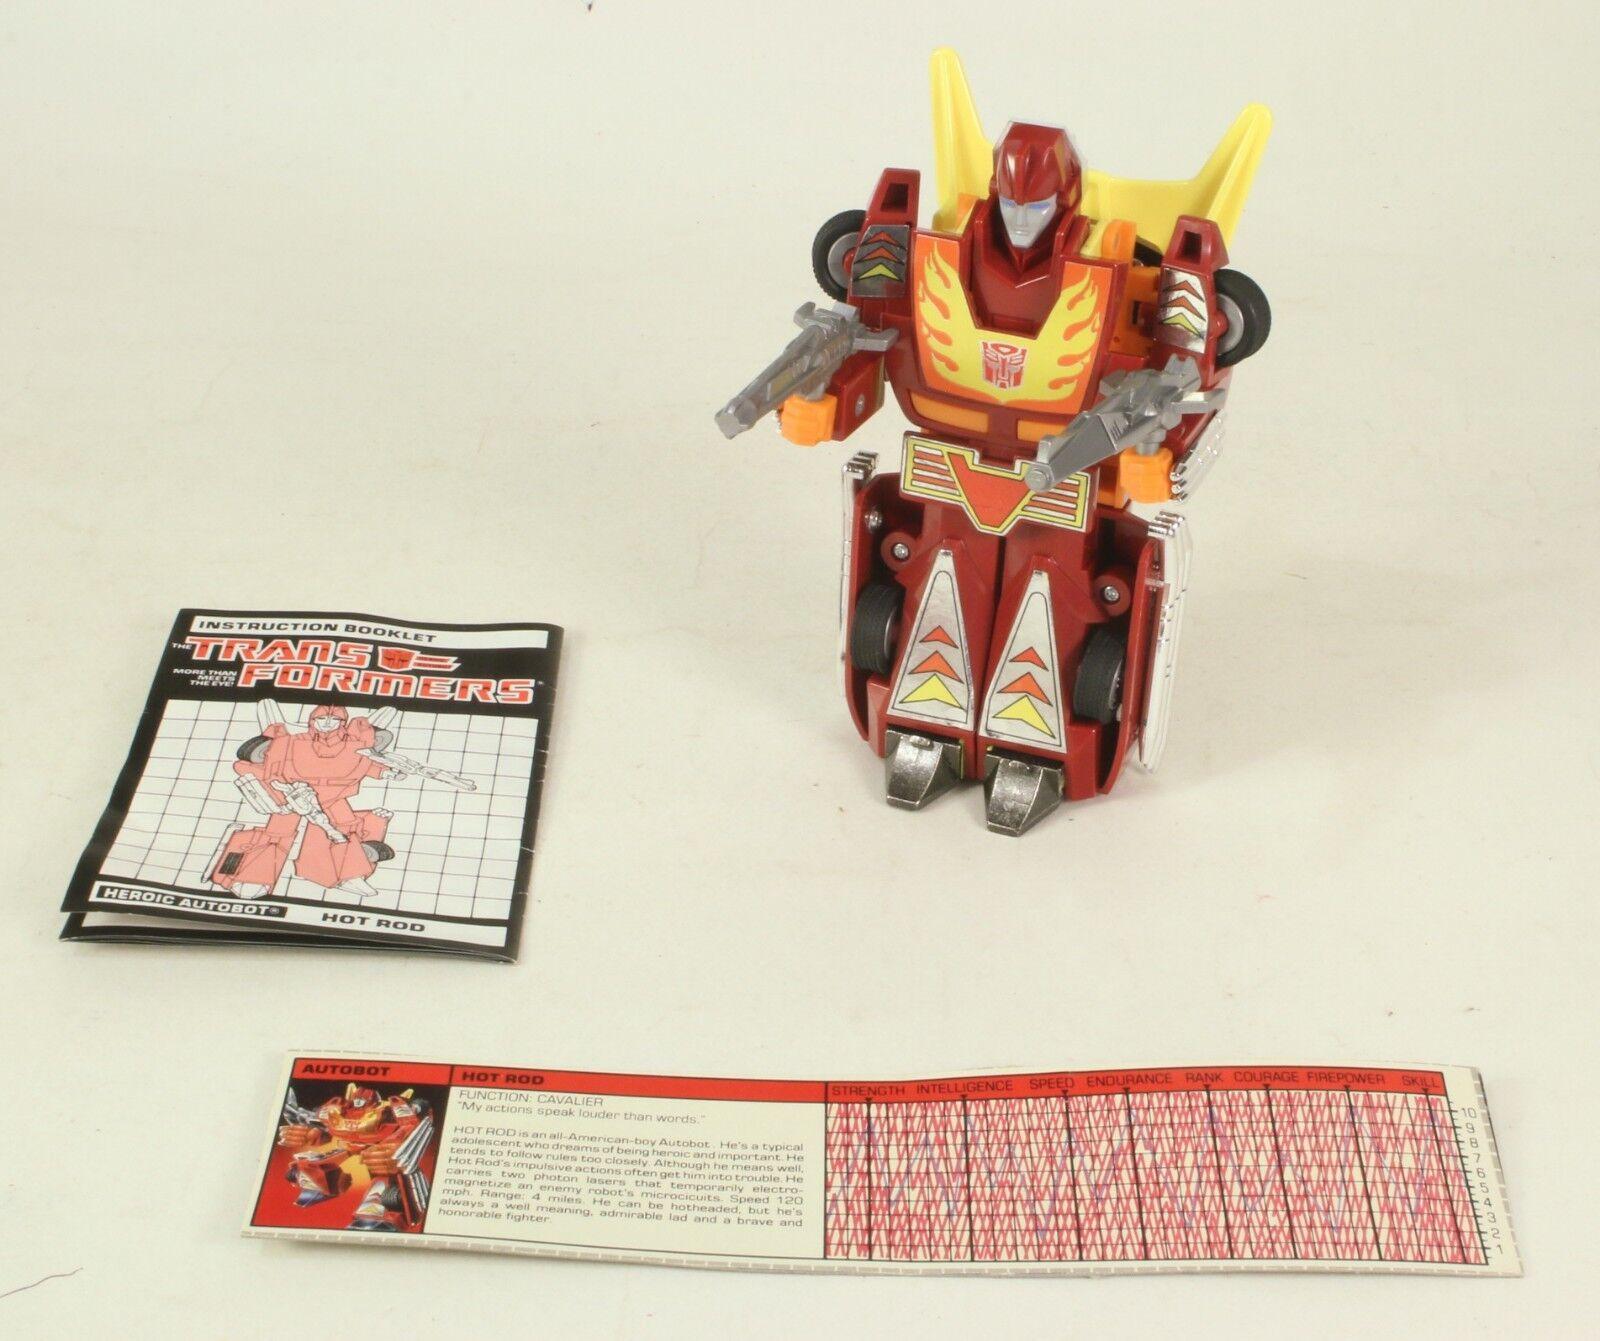 Transformers G1 Generation 1 Hot Rod Rod Rod  Hasbro e72d7a